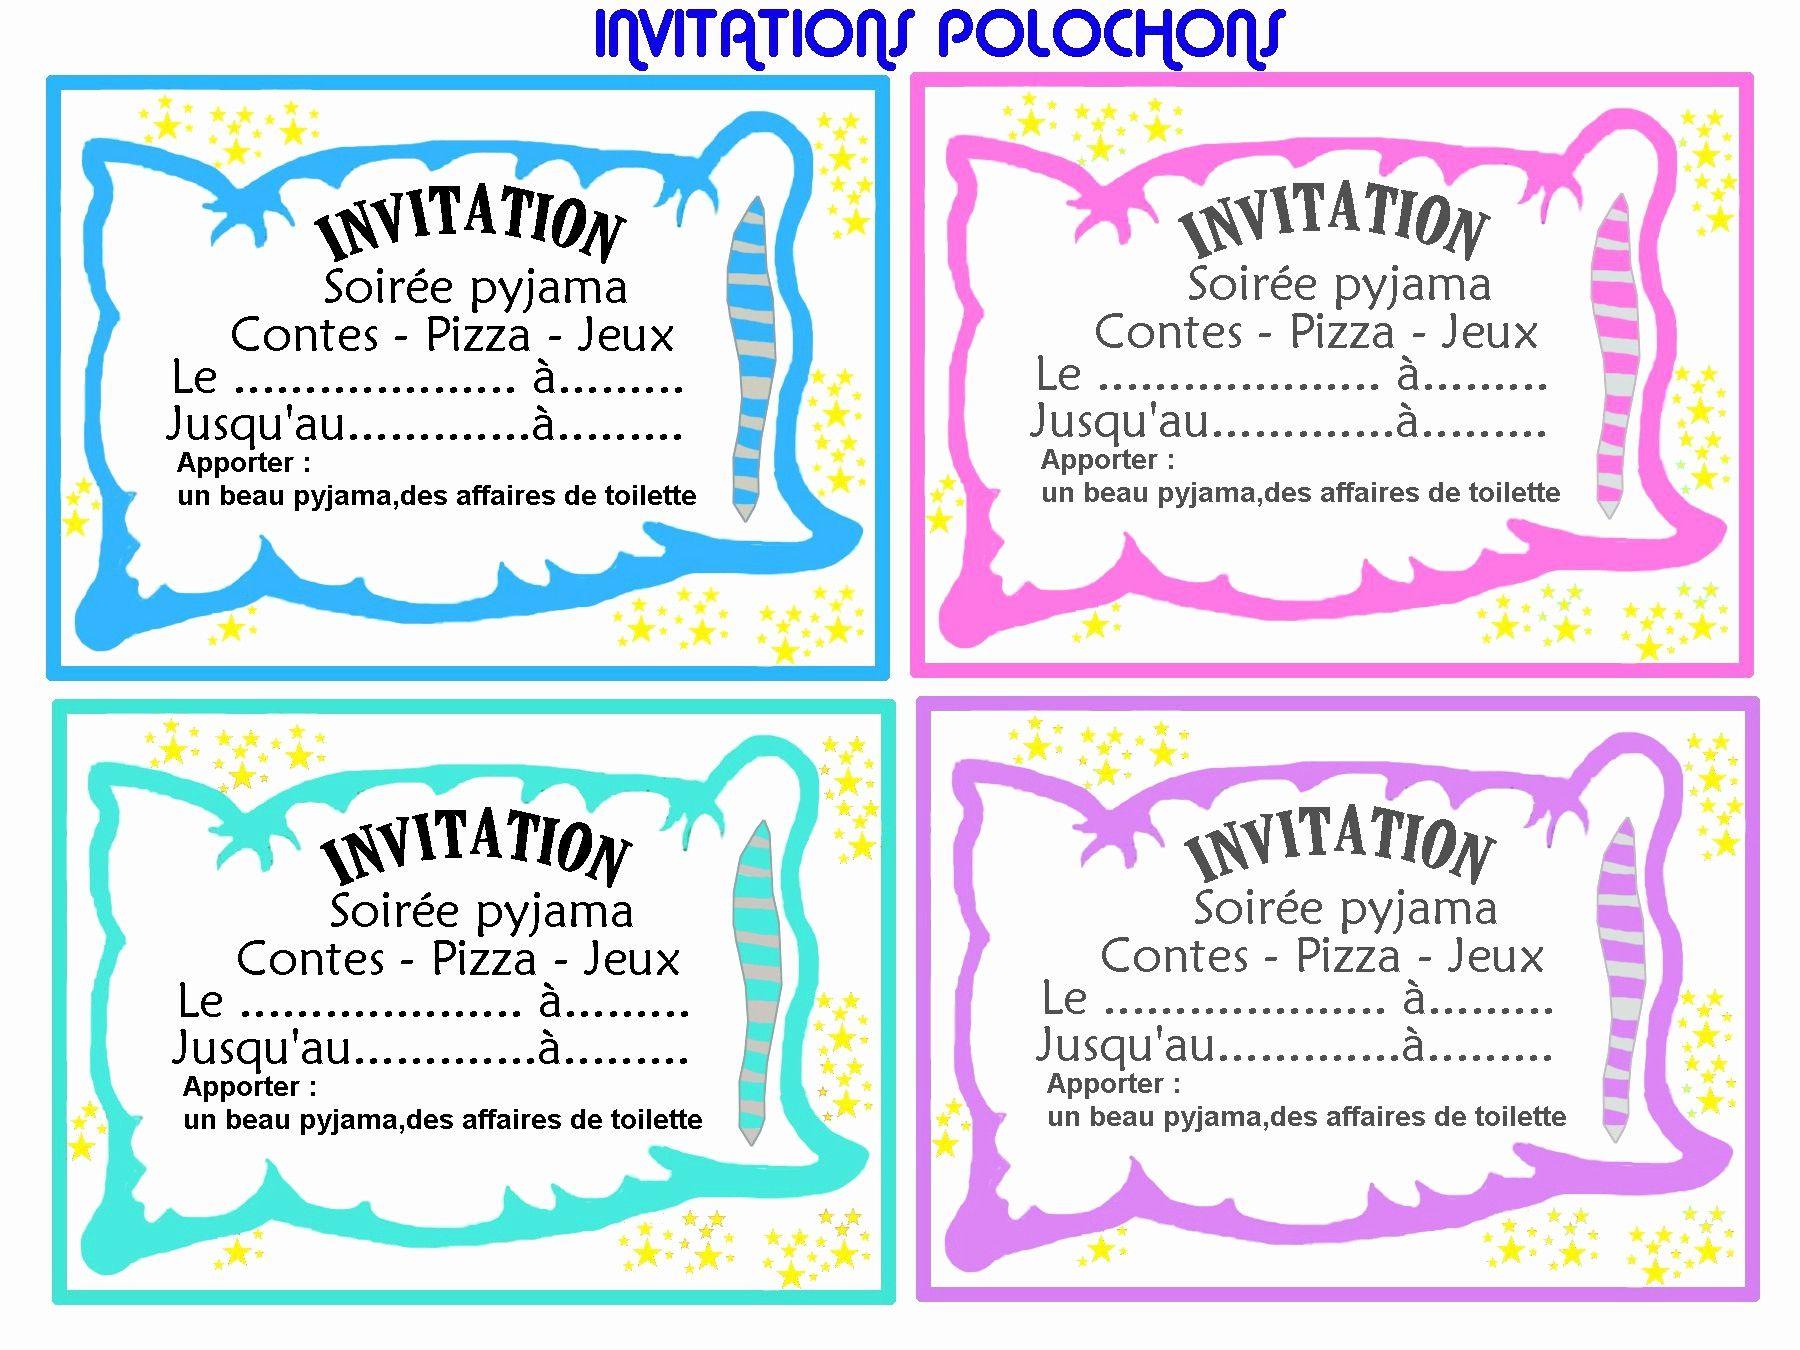 Inspirational Invitation Anniversaire 90 Ans Gratuite A Imprimer Invitations Party Diy Invitations Invitations